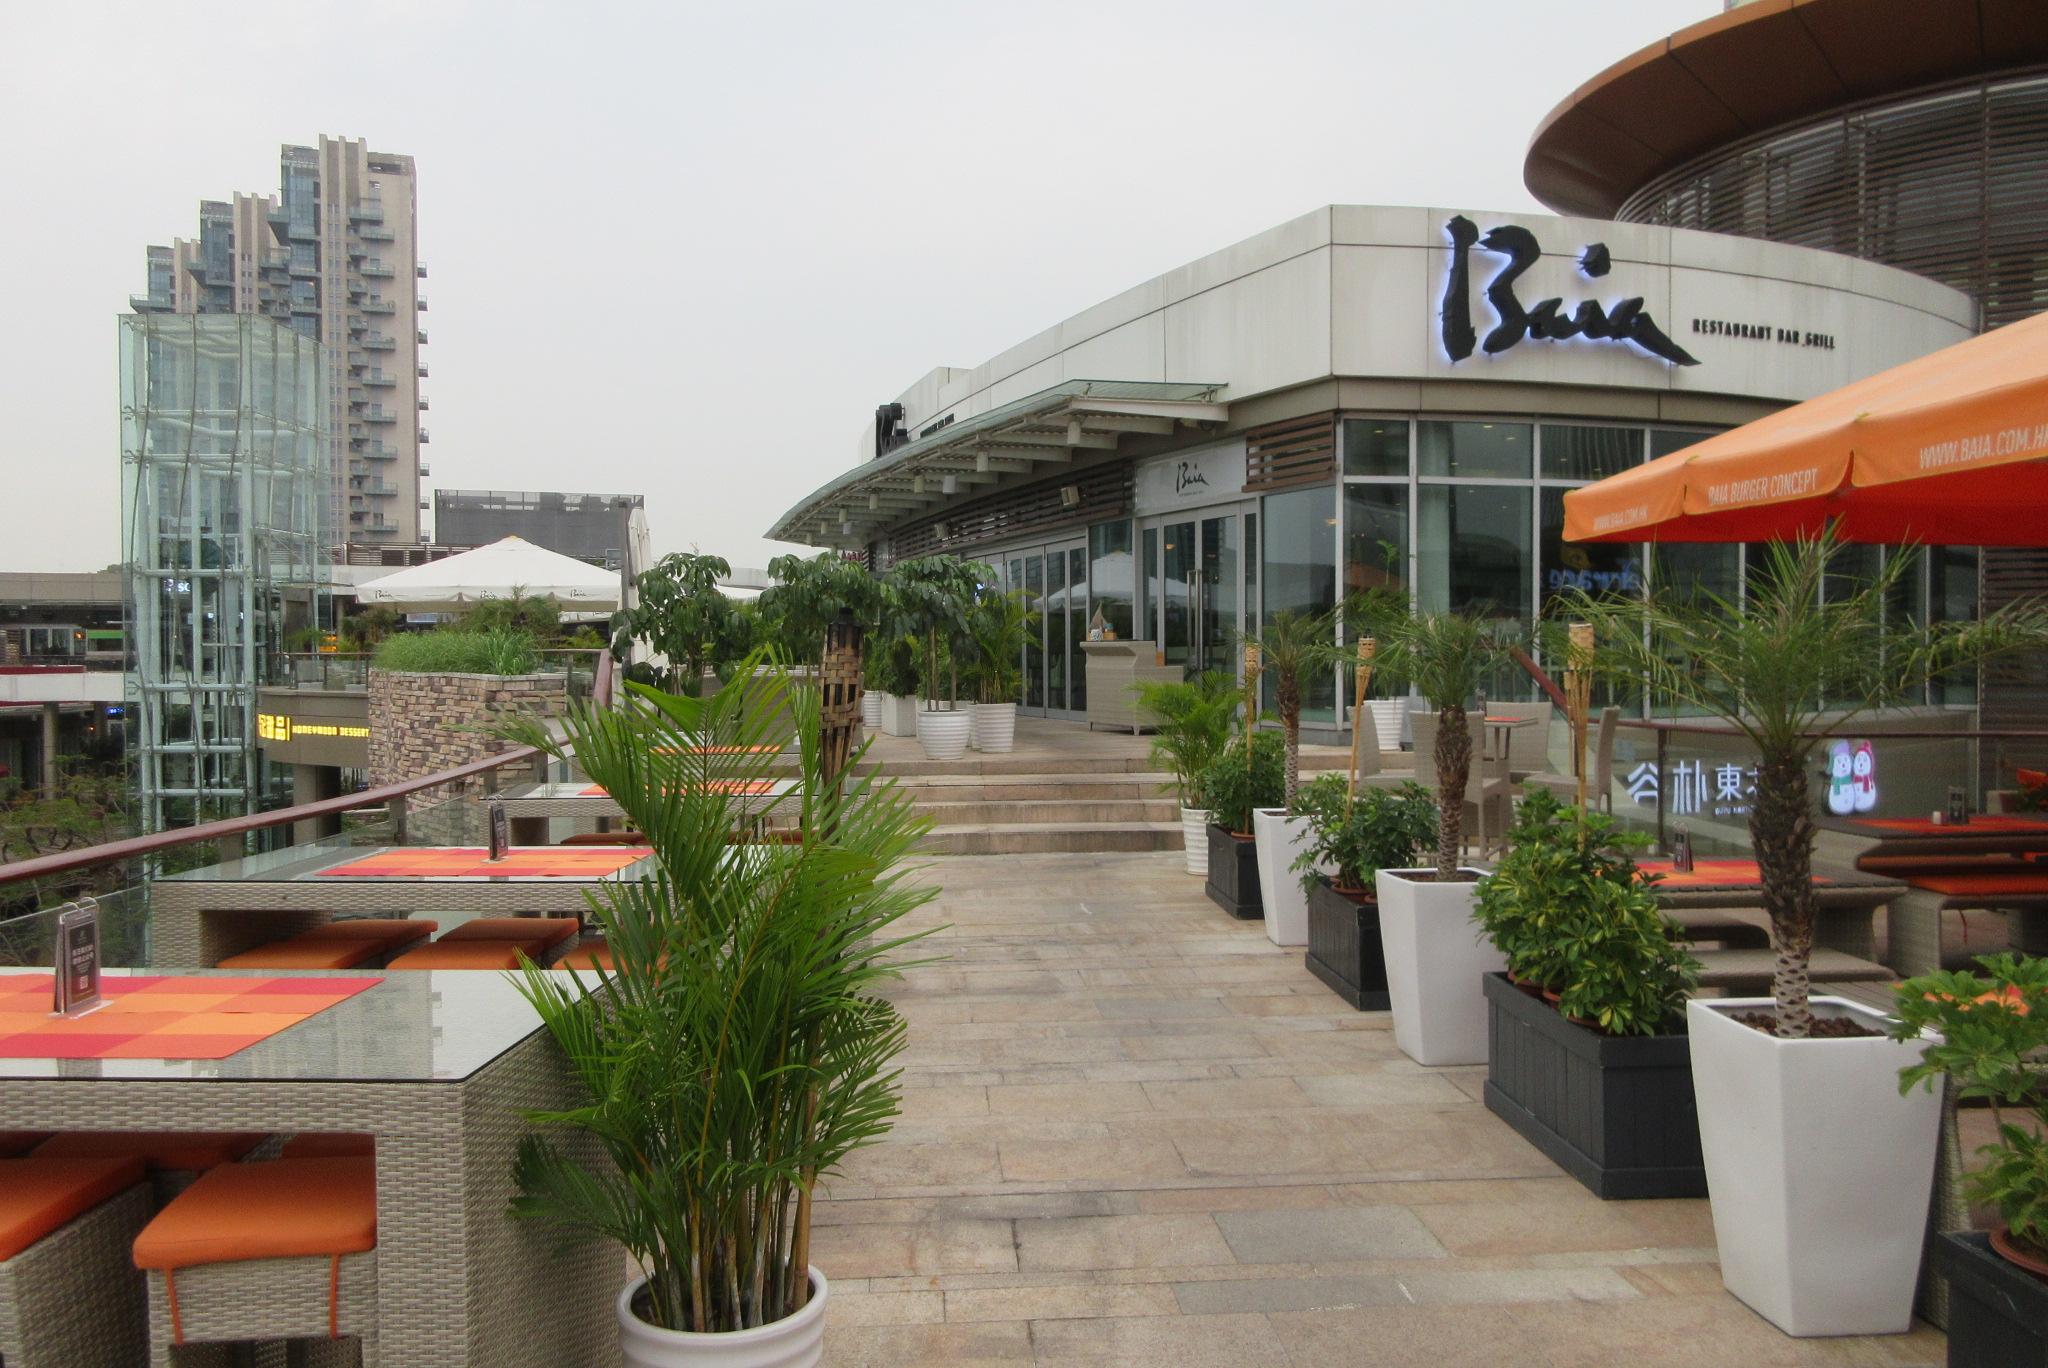 File burger king interior cork ireland 2012 jpg wikimedia commons - File Sz Shenzhen Futian Evening Sea World Restaurant